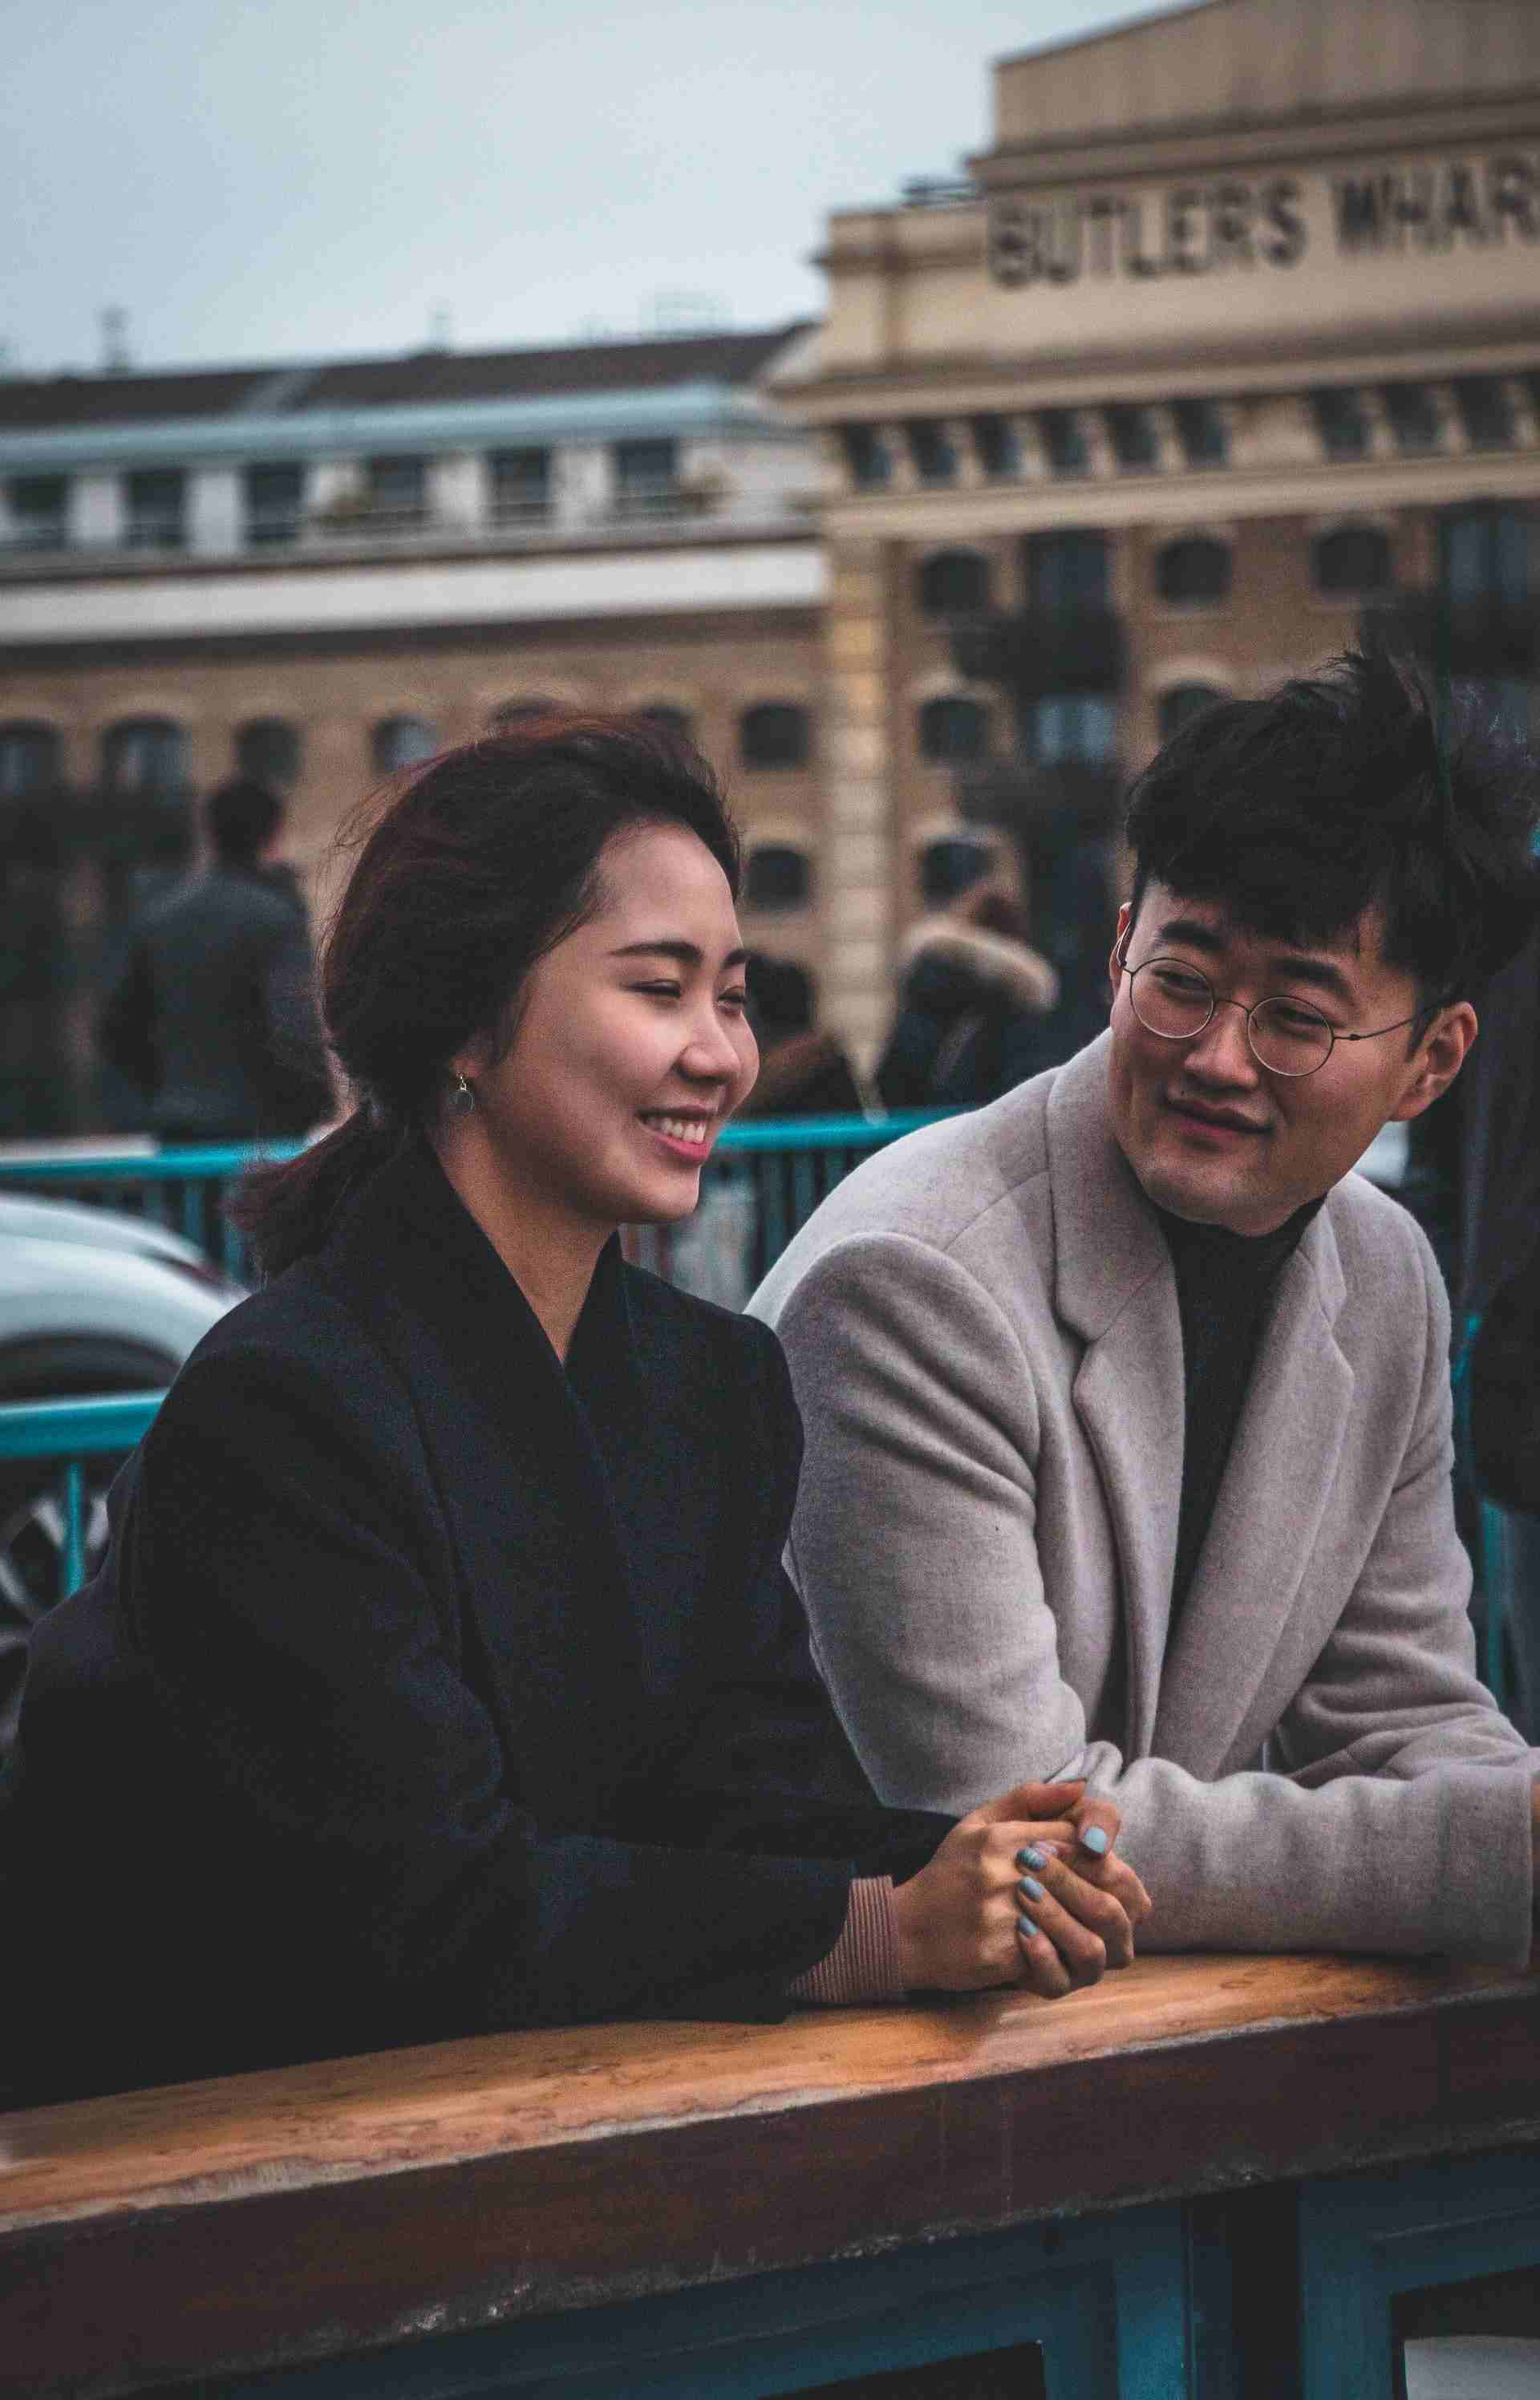 Alasan Pasangan Memilih Hubungan Tanpa Status